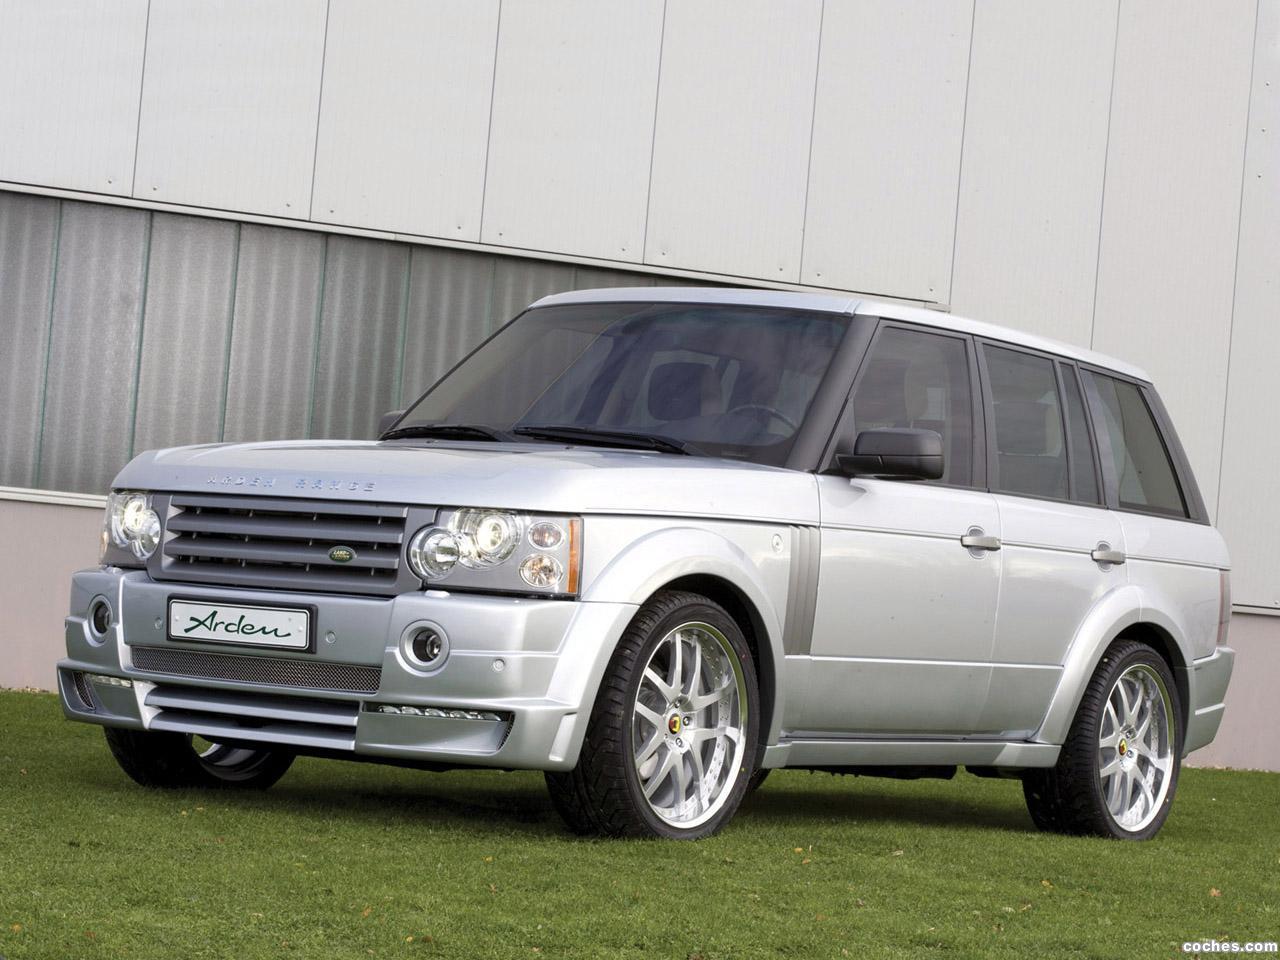 Foto 0 de Arden Land Rover Range Rover AR7 Highlander 2007